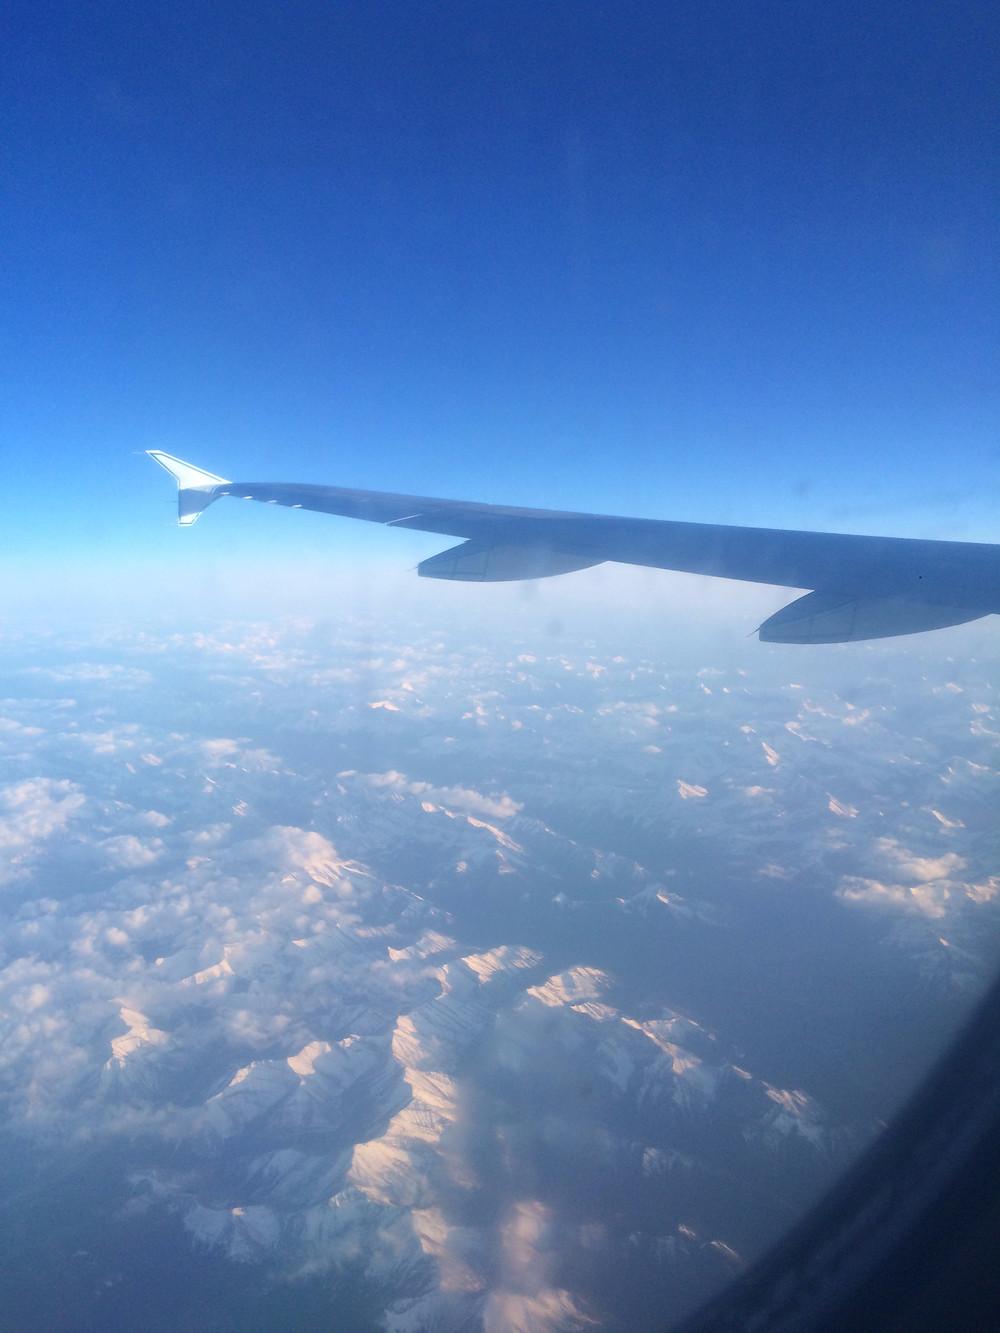 Olivia from plane_edited.JPG